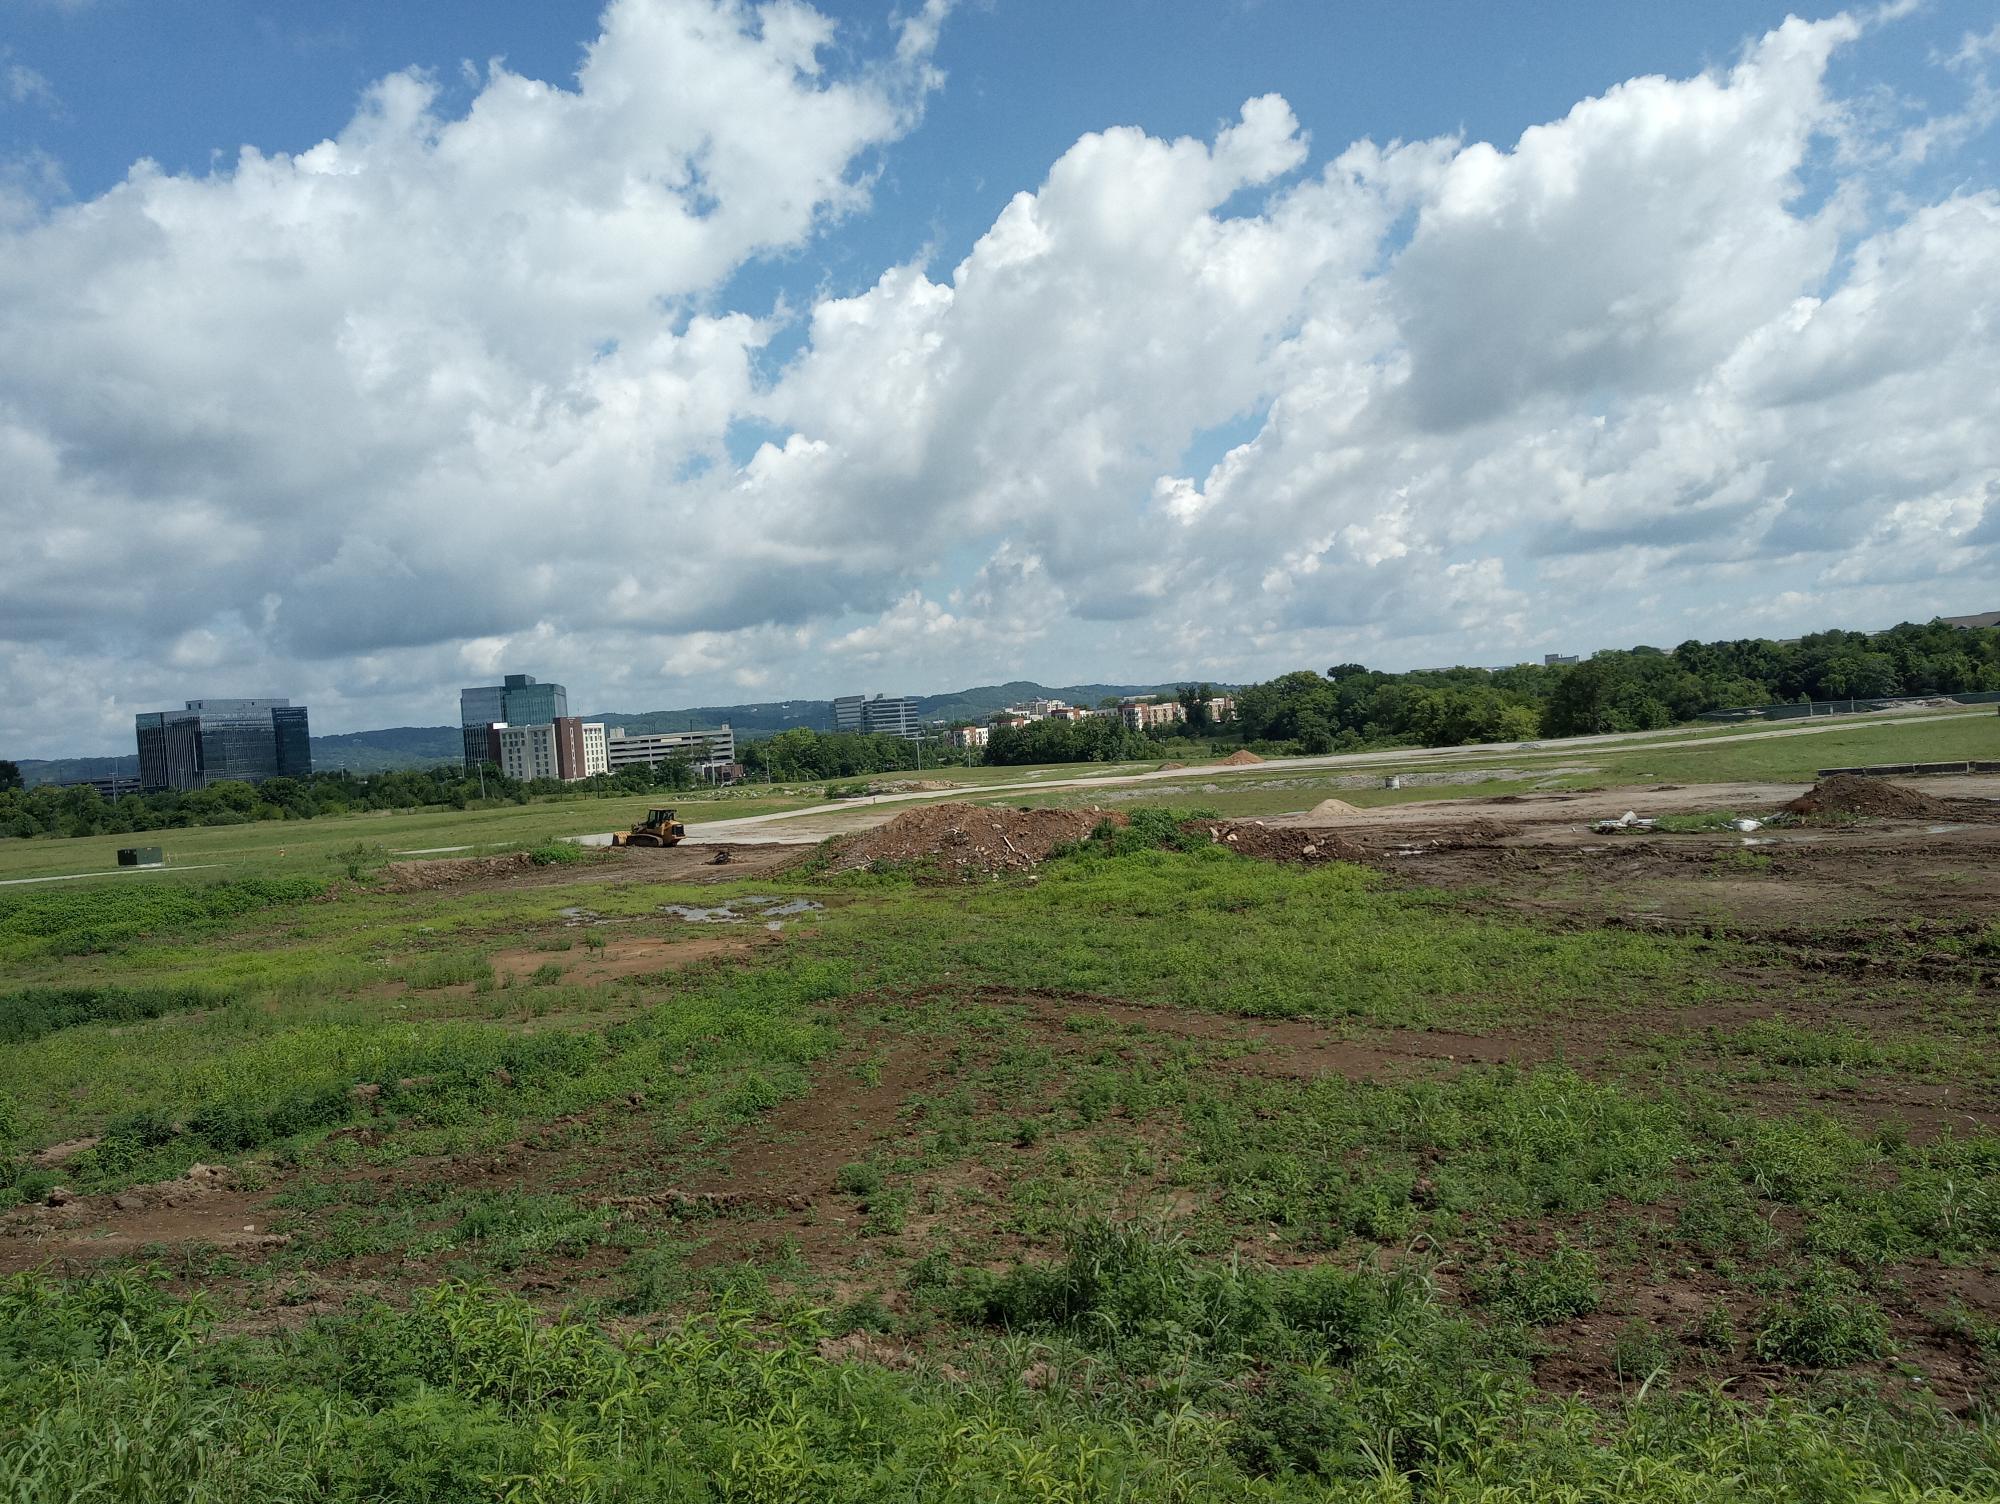 Ovation developer pays back a major loan, retains ownership of land